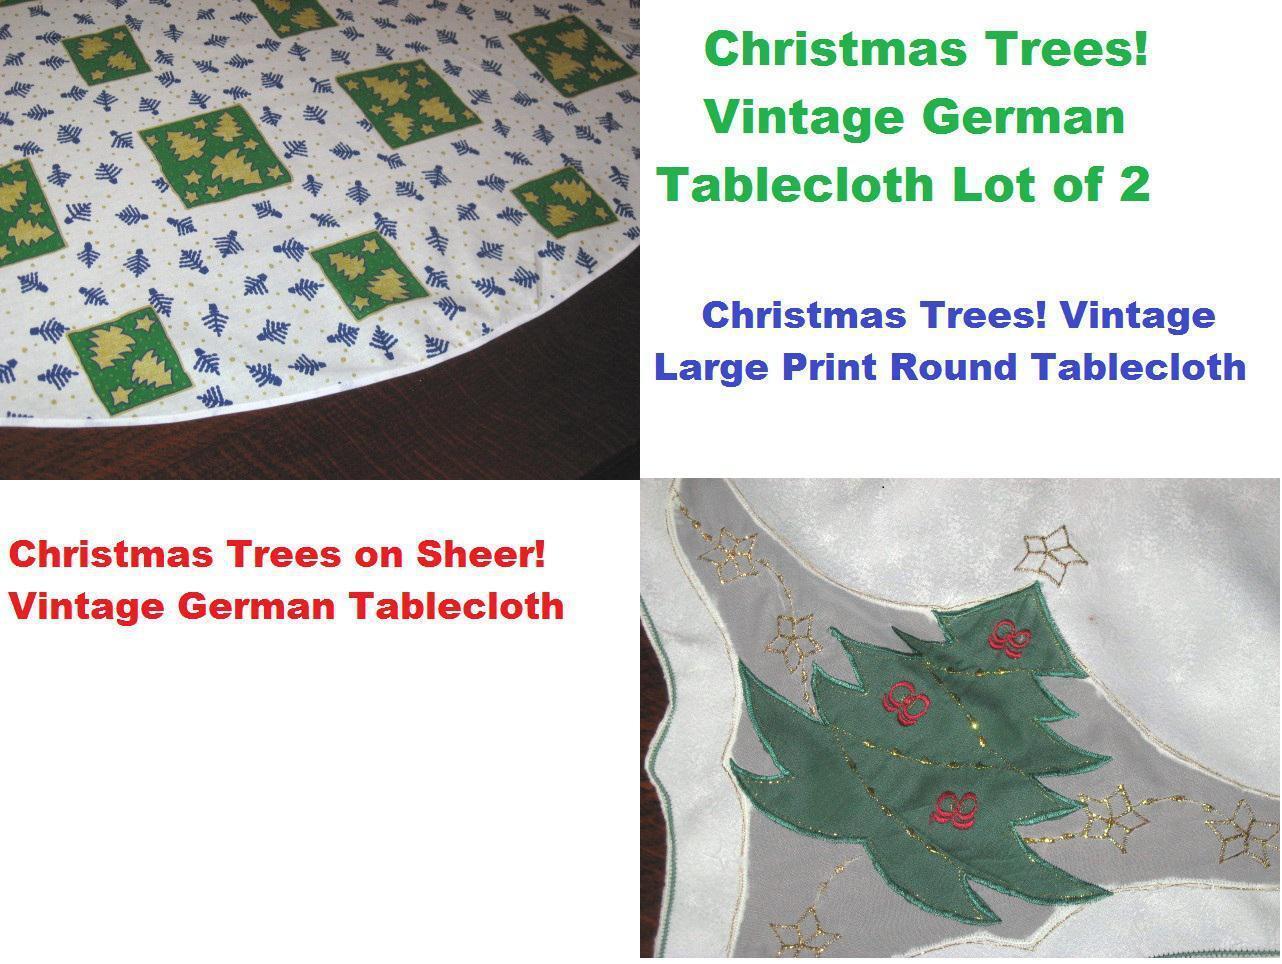 CHRISTMAS TREES  VTG GERMAN DAMASK TABLECLOTH + LARGE ROUND PRINT TABLECLOTH